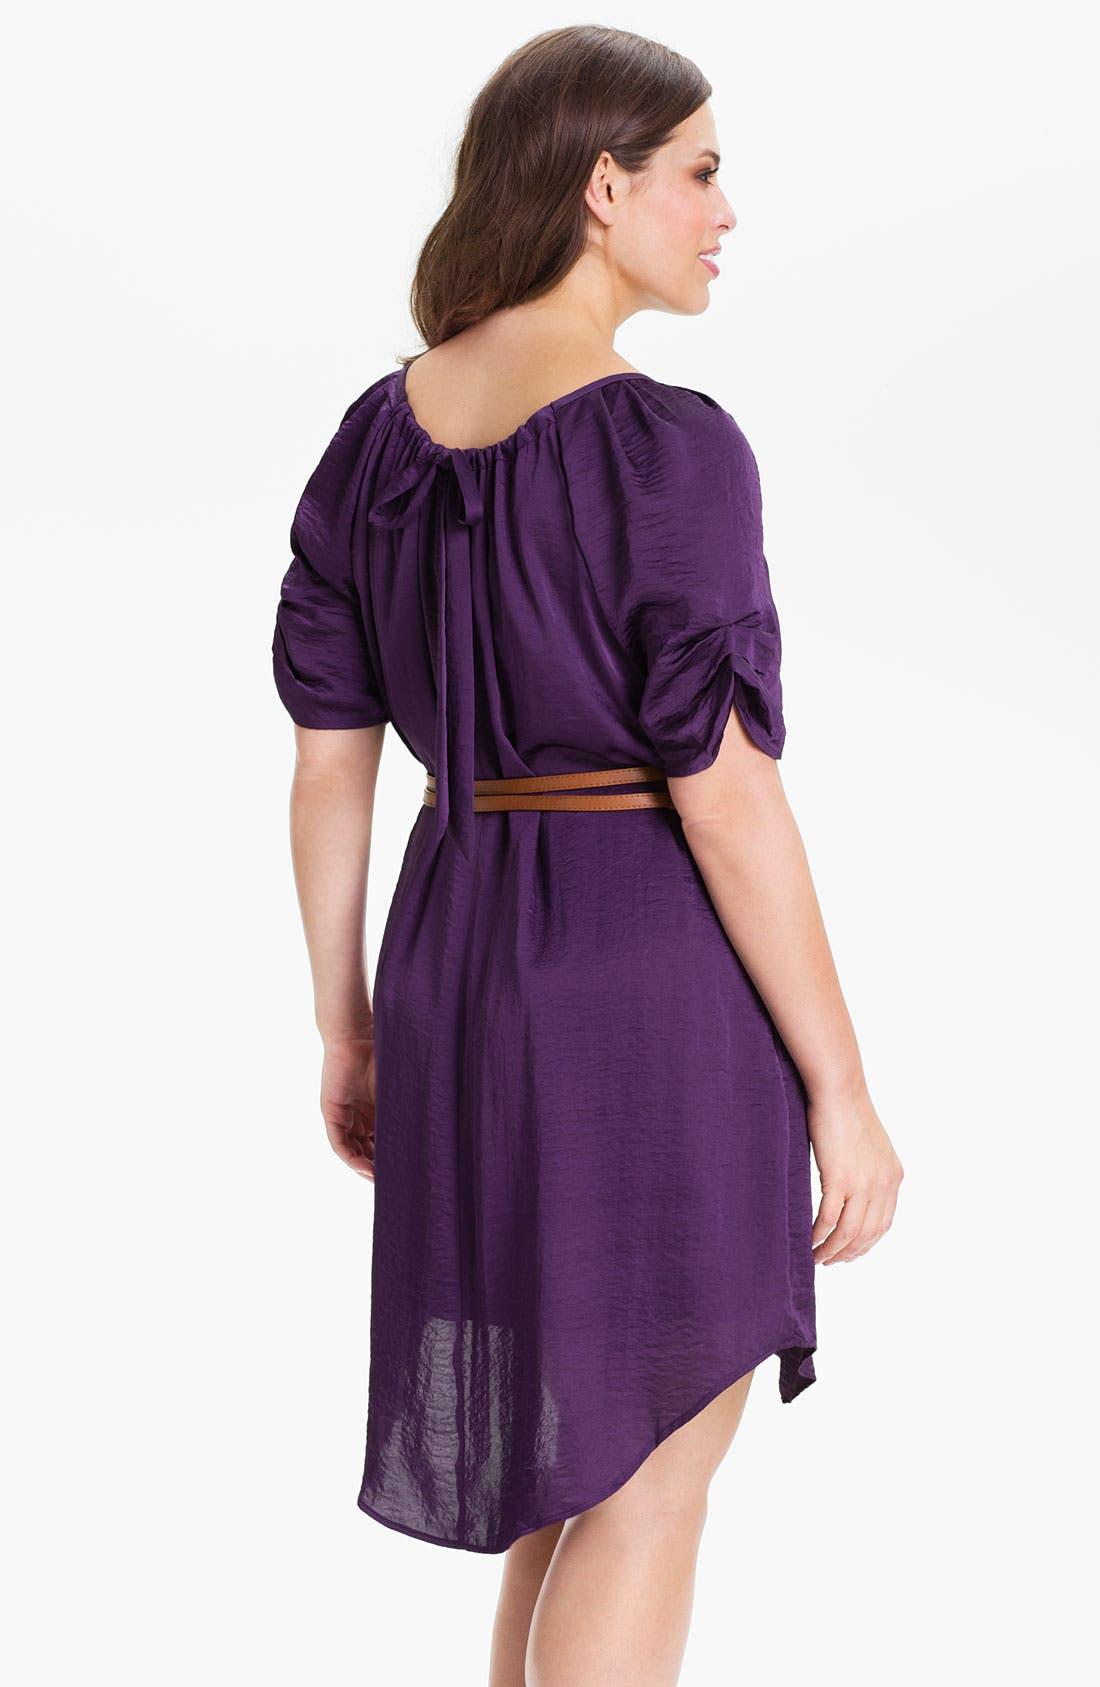 Alternate Image 2  - Jessica Simpson Belted Scoop Neck Dress (Plus)